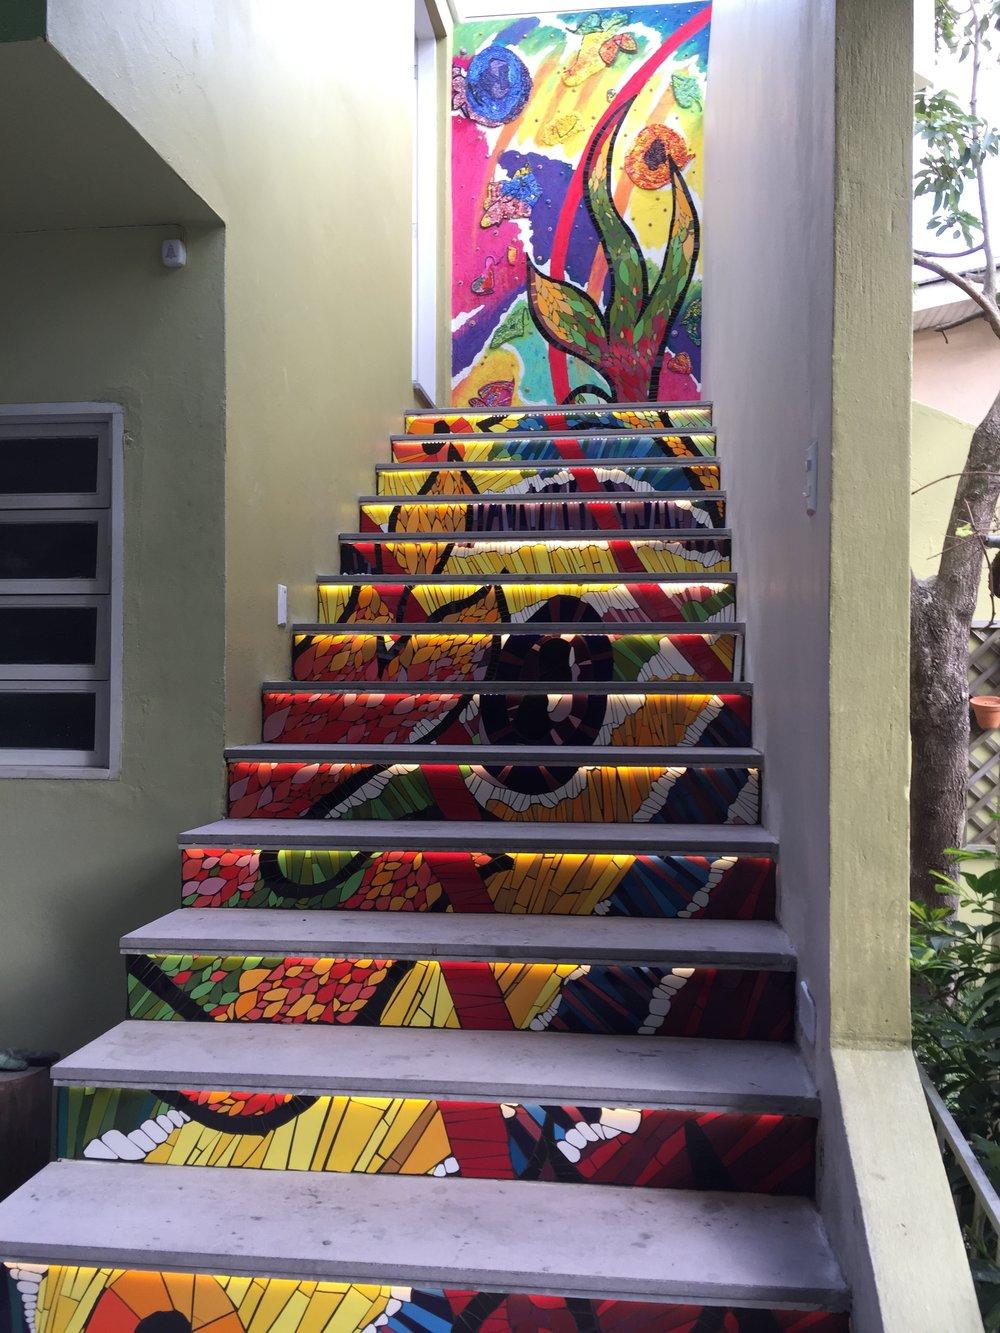 Mosaika Escola de Arte Mural (Brazil)